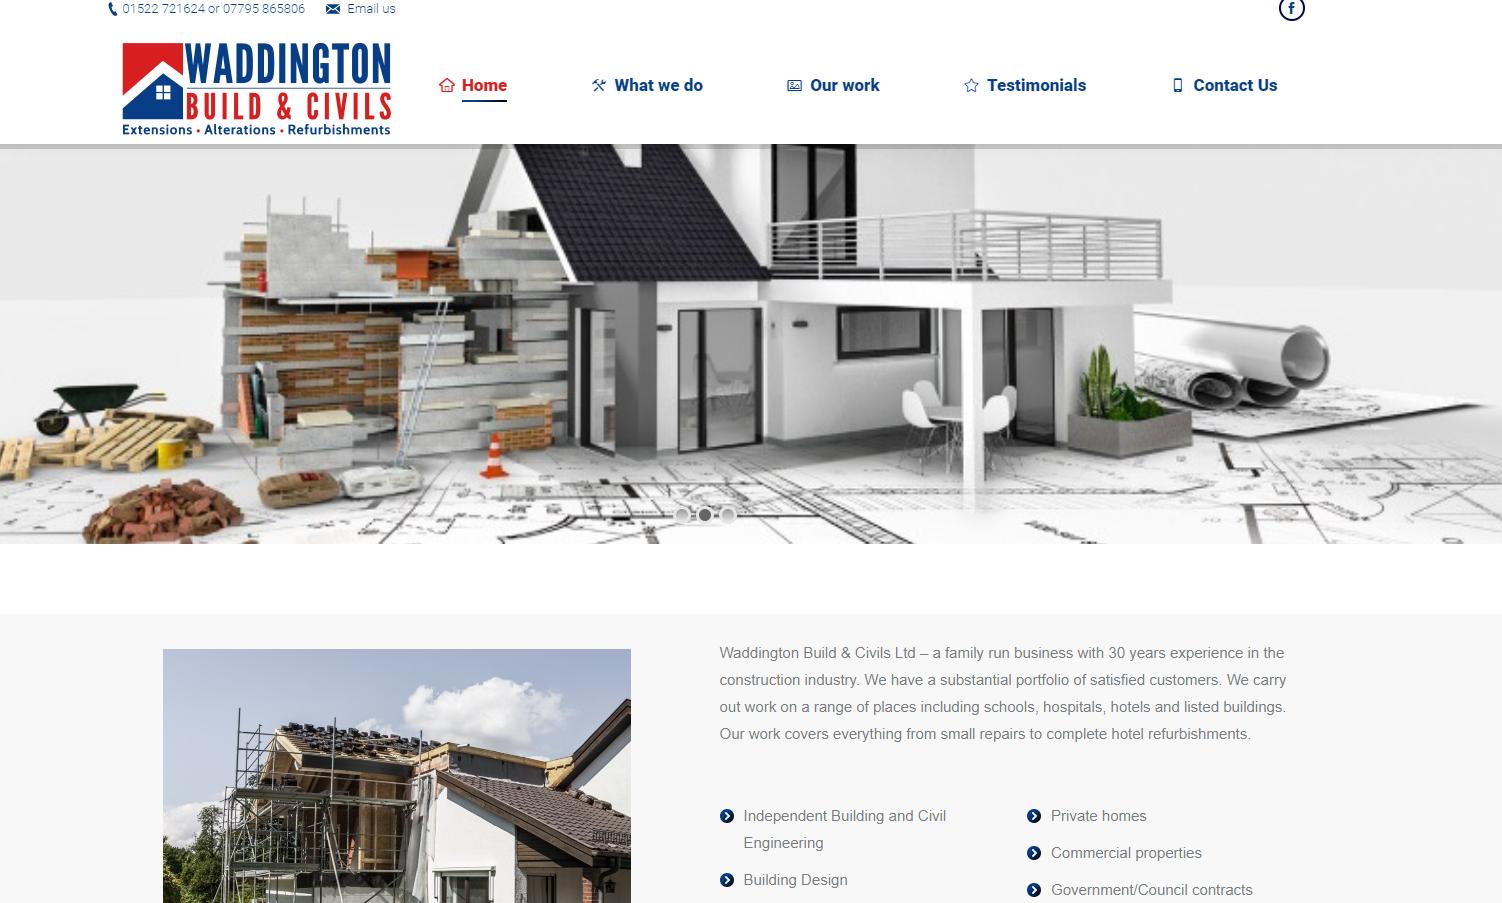 Waddington Build